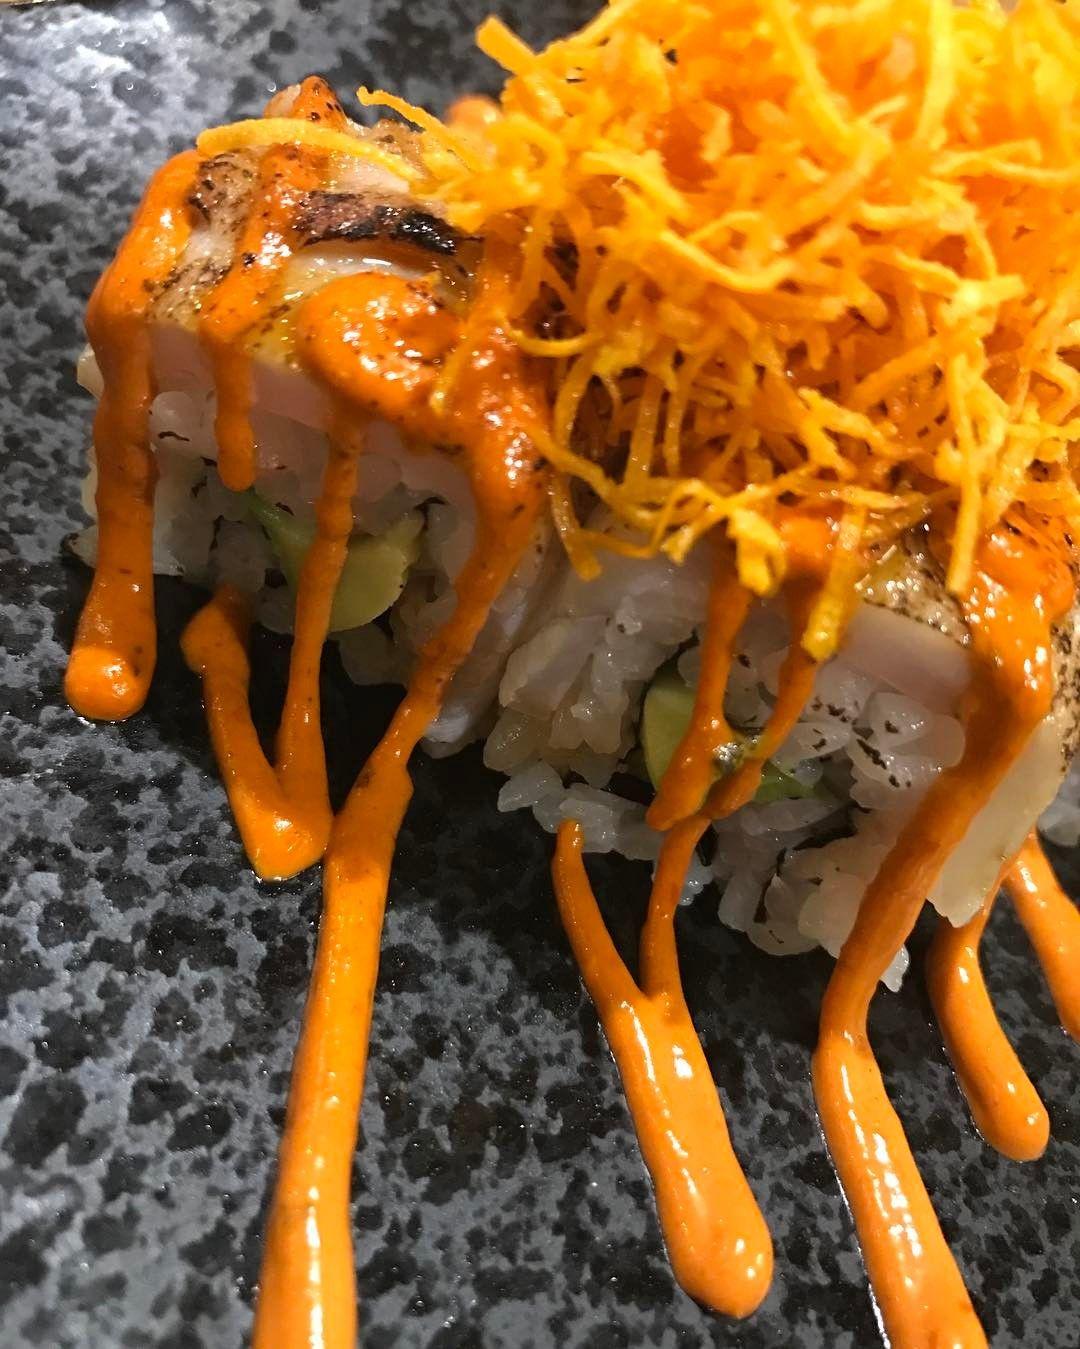 Uramaki anticuchero: langostinos aguacate corvina y salsa de anticucho. #gastronomia #food